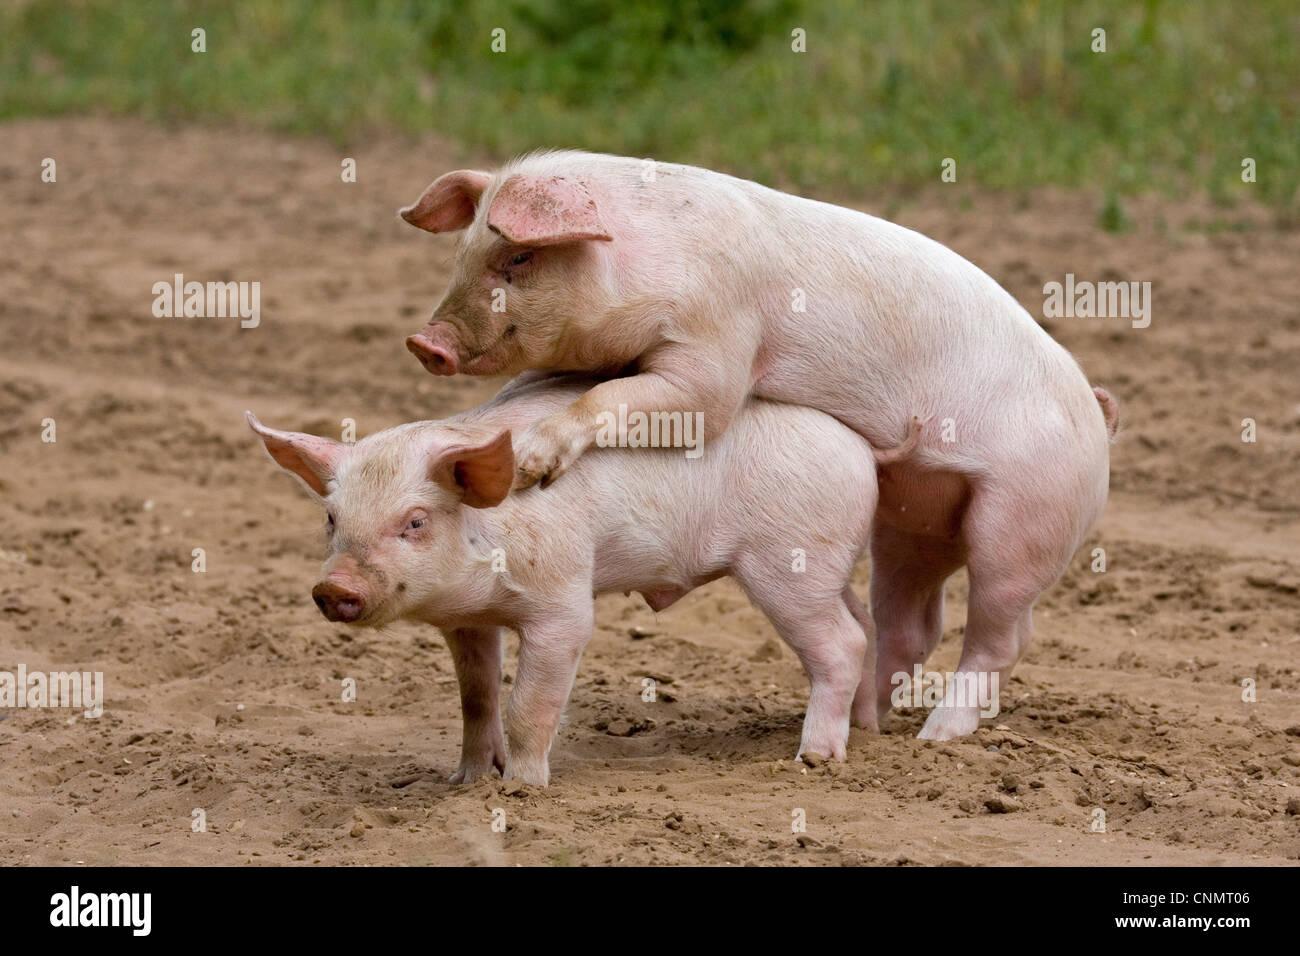 Cute Piggies Wallpaper Baby Duroc Www Pixshark Com Images Galleries With A Bite